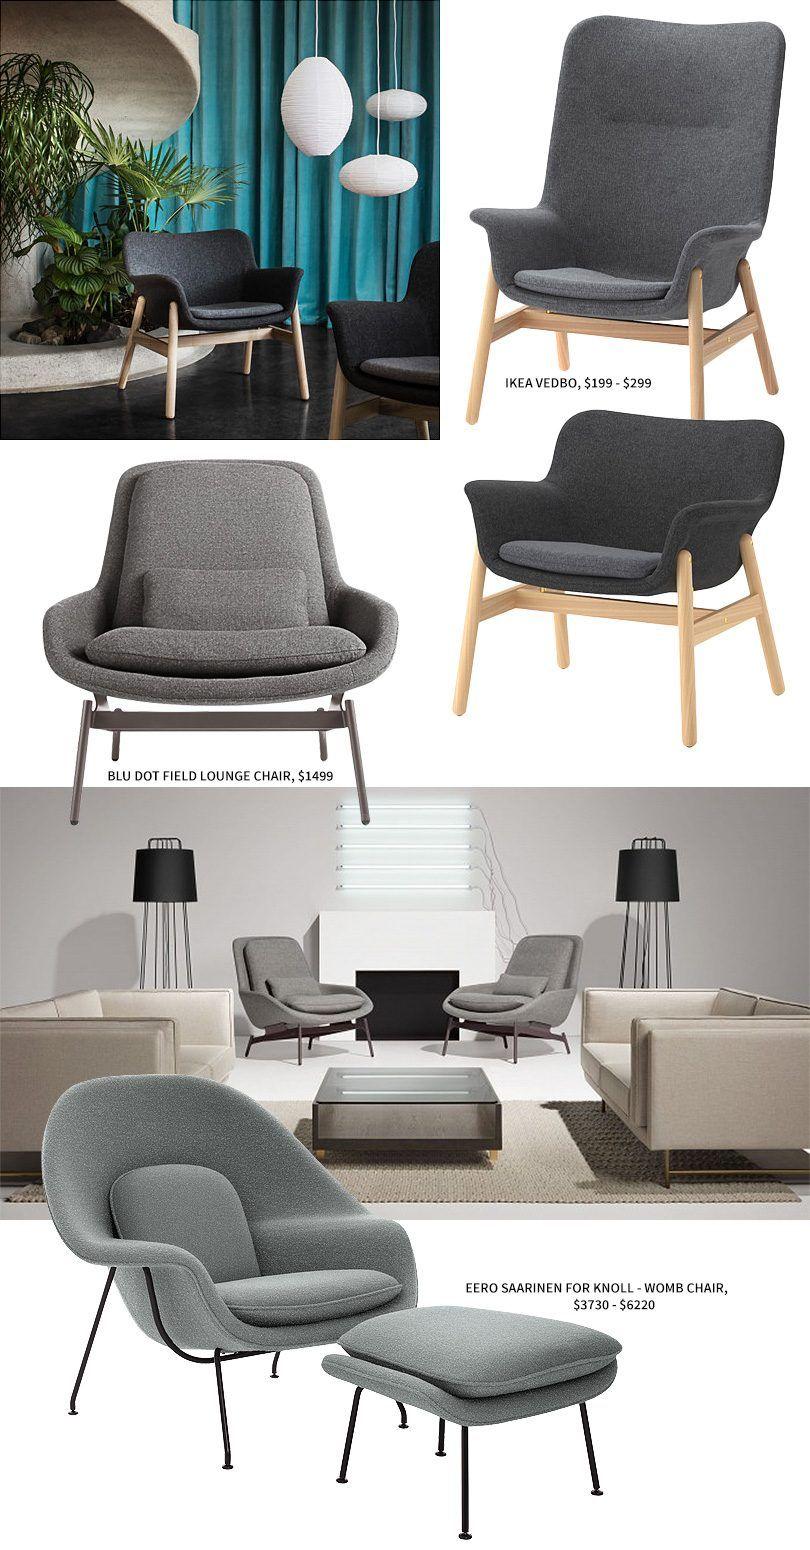 ikea vedbo vs blu dot field lounge chair vs eero saarinen womb chair